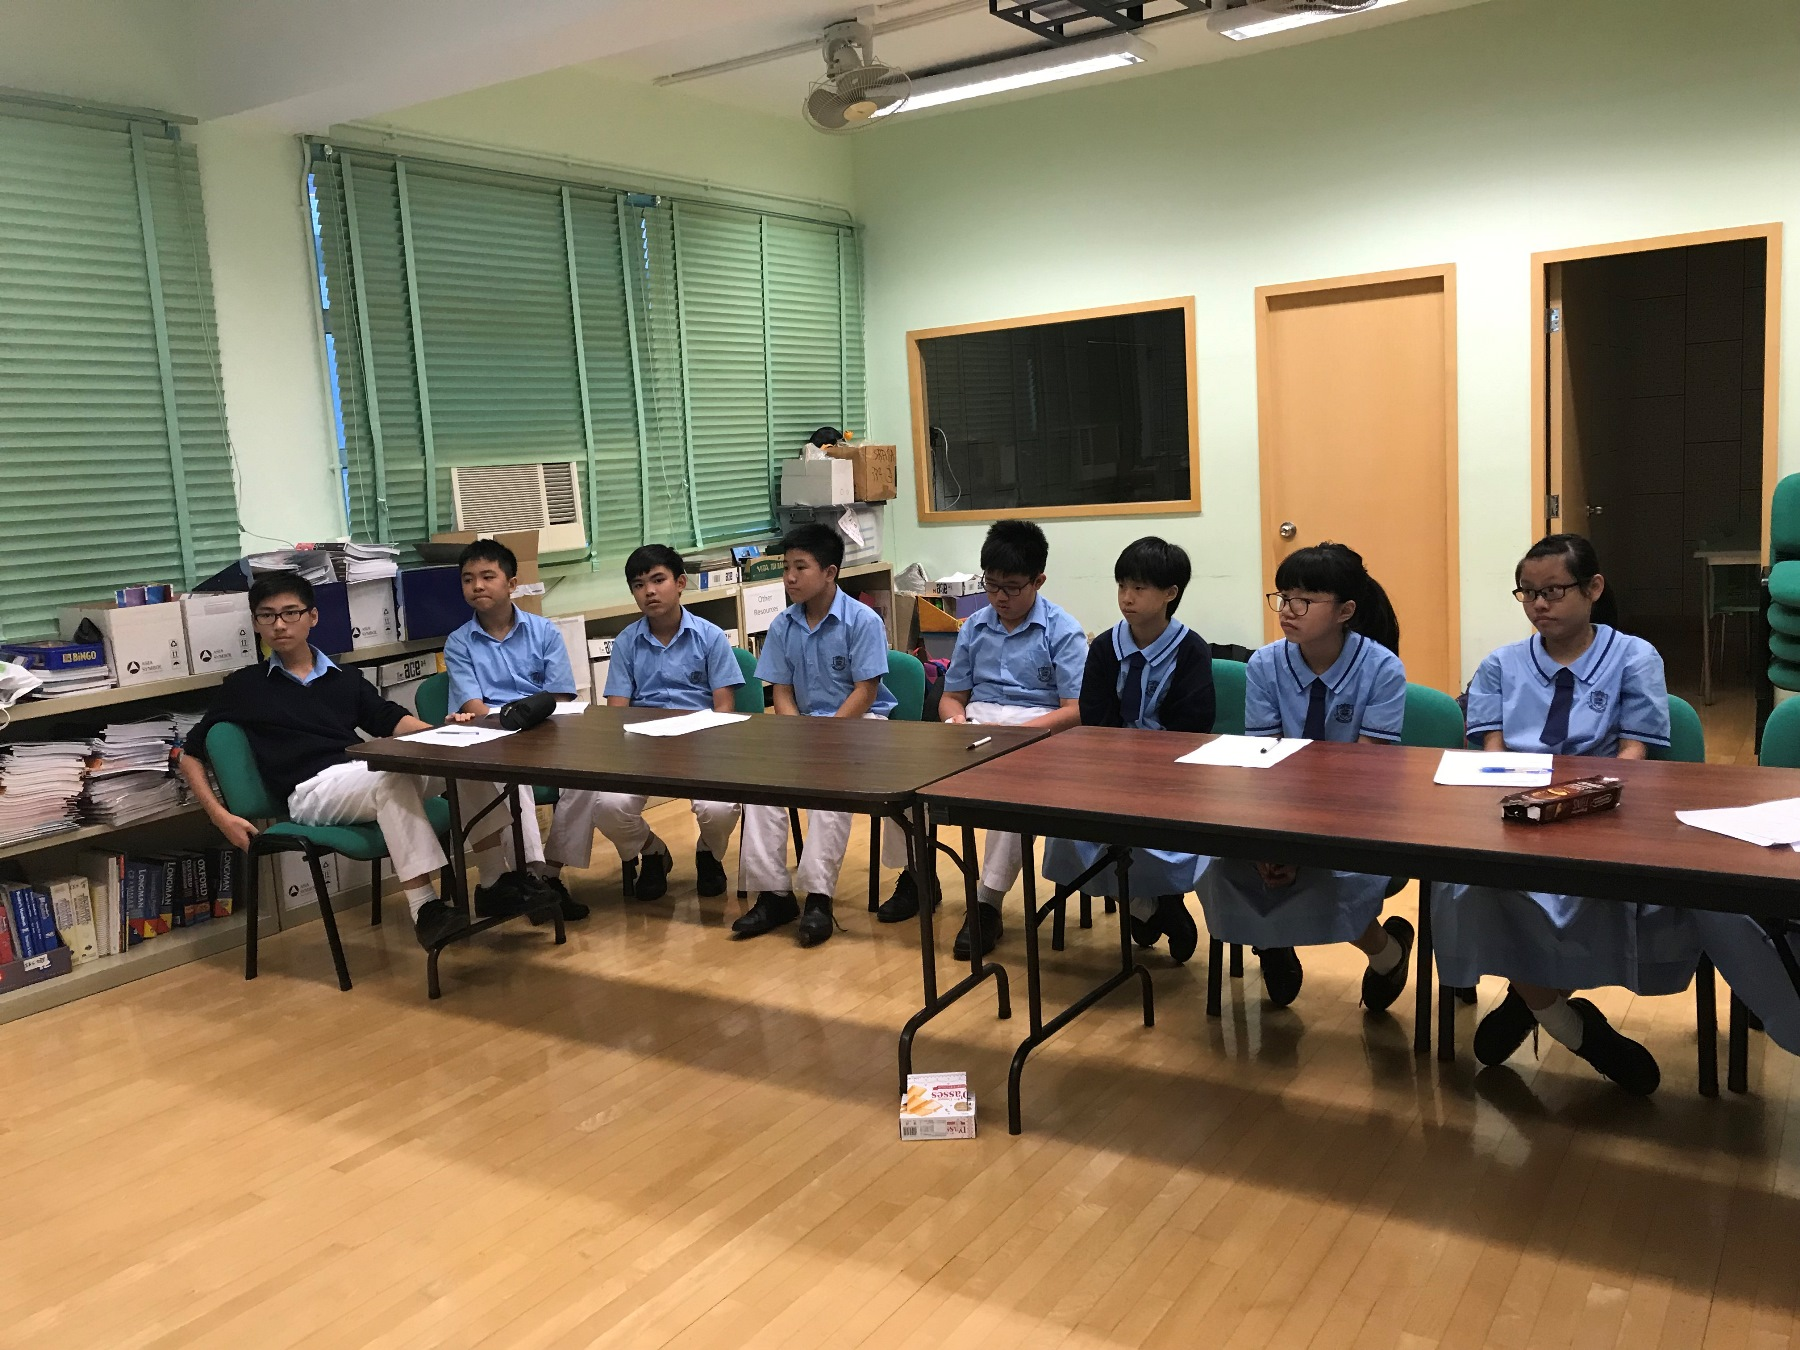 http://npc.edu.hk/sites/default/files/img_0625.jpg